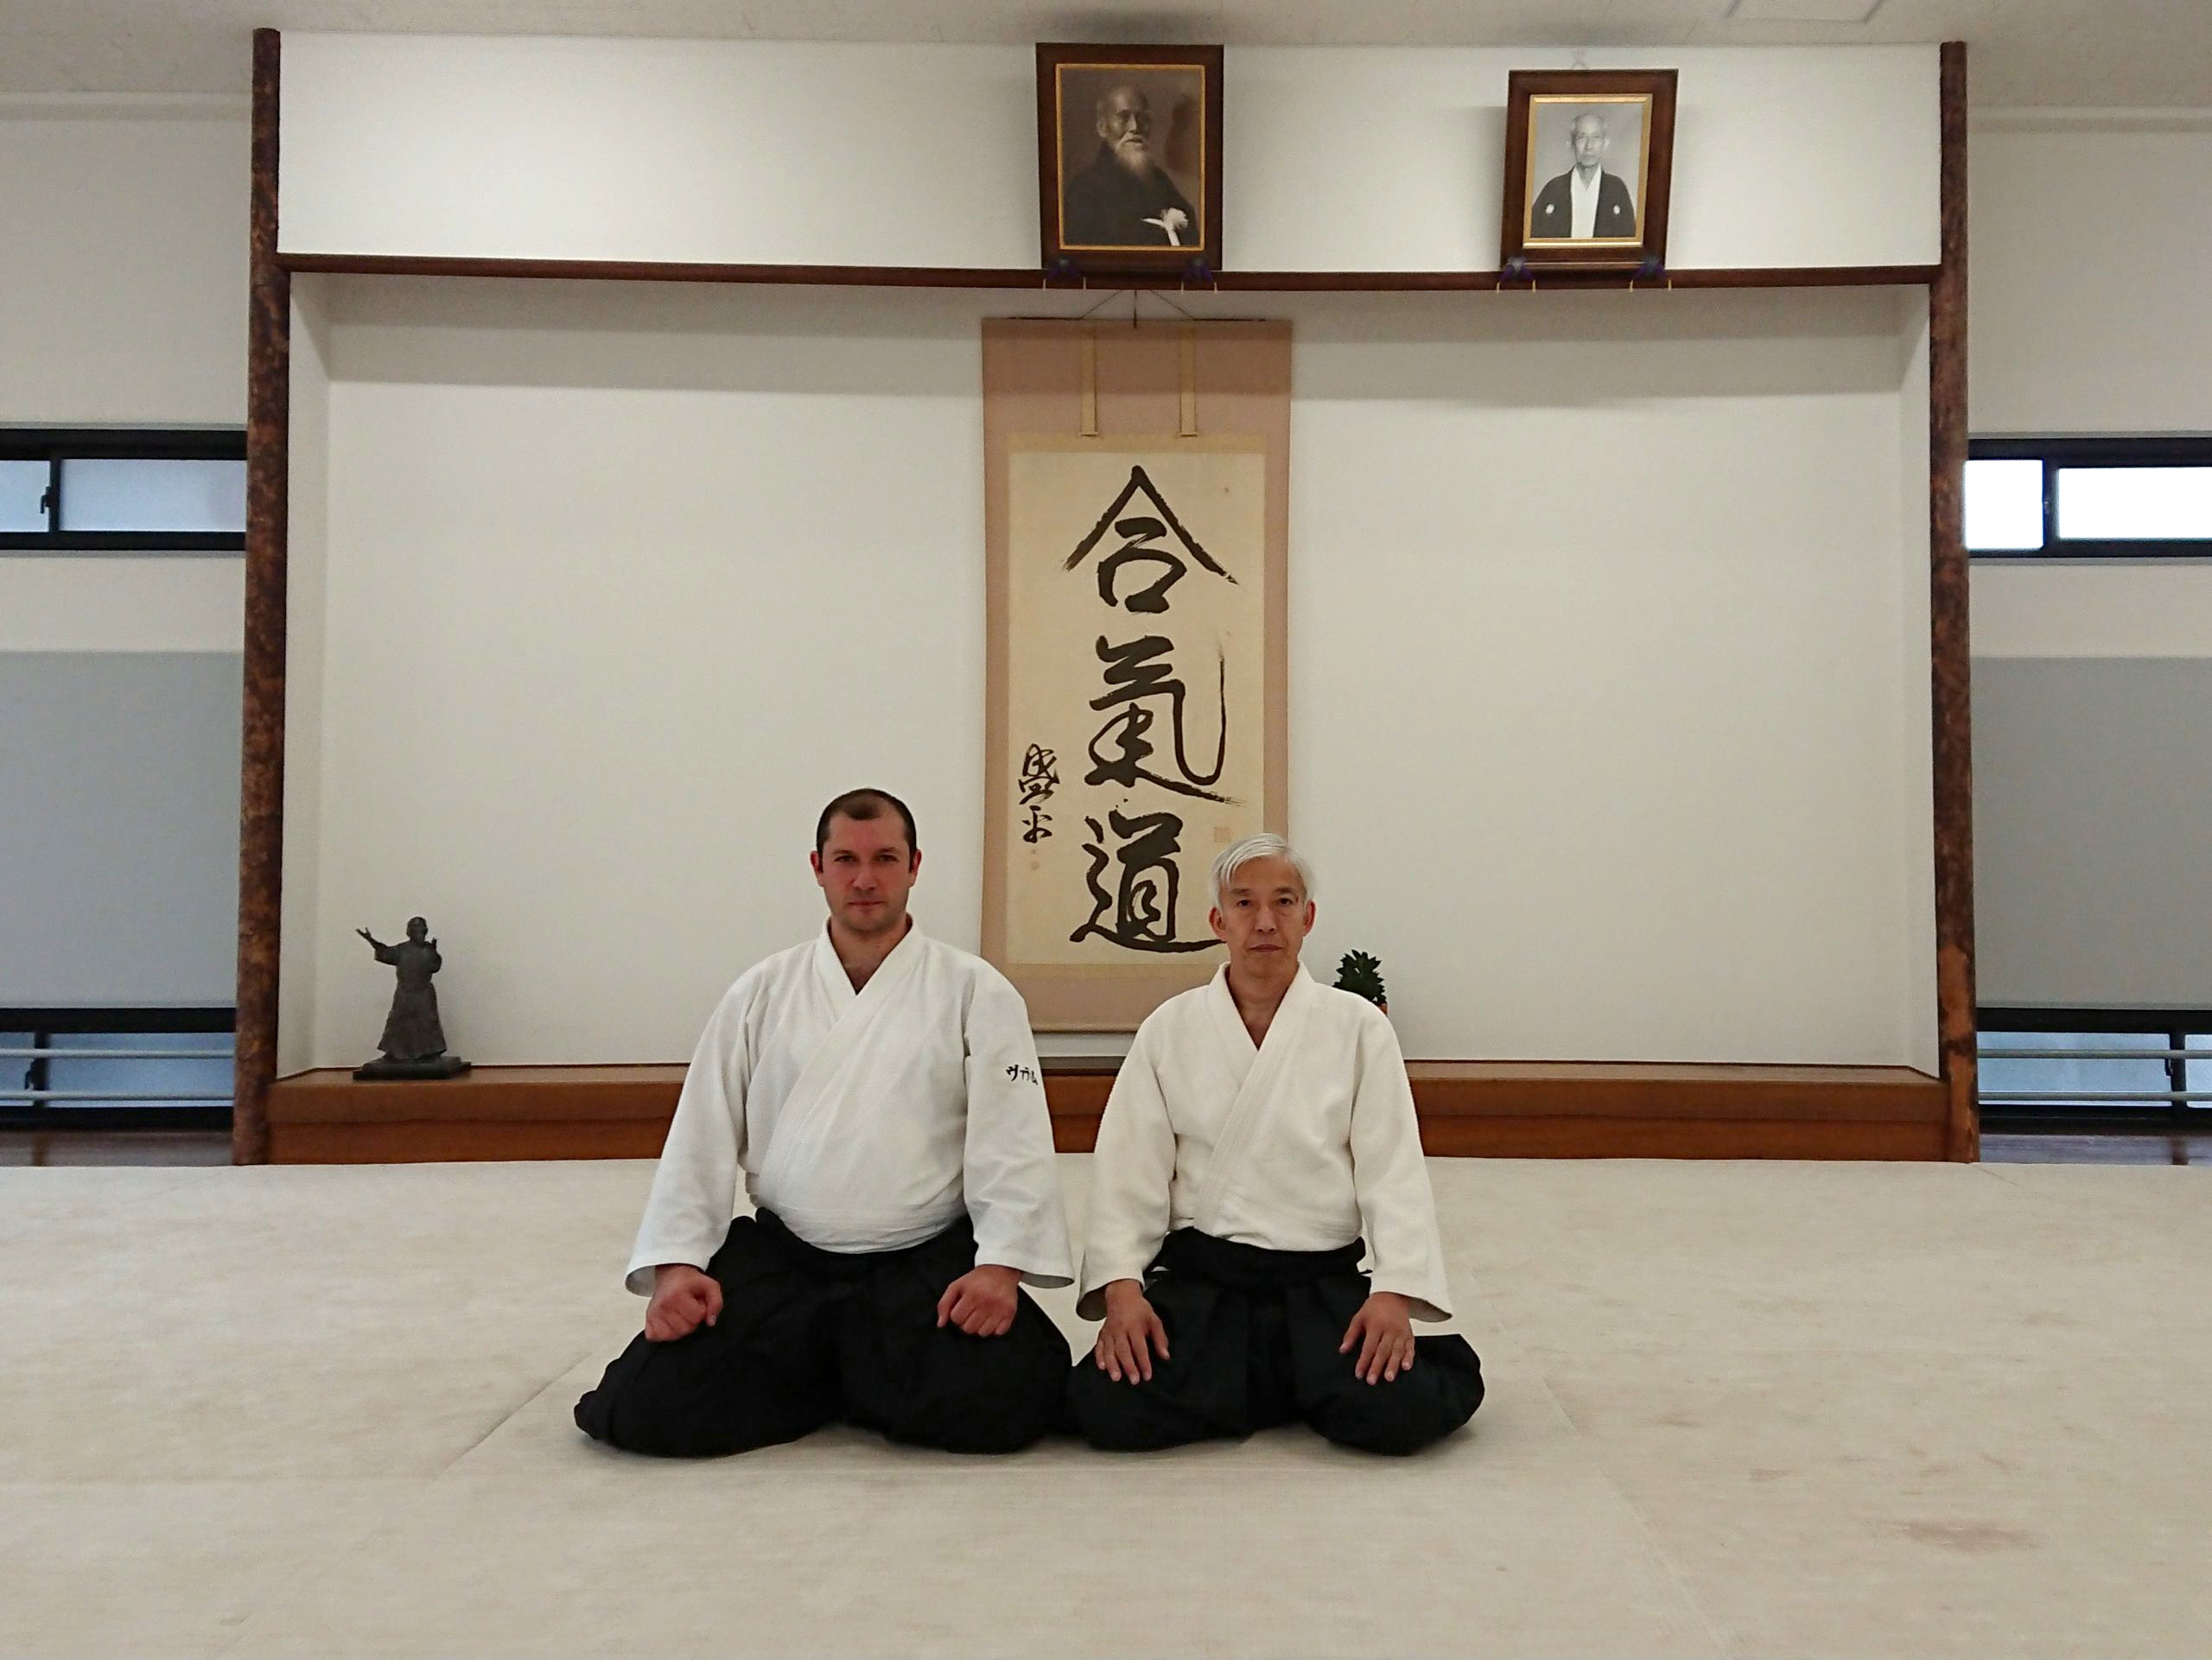 В.И.Грачёв с Айкидо Досю Моритэру Уэсибой в Айкикай Хомбу Додзё, Токио